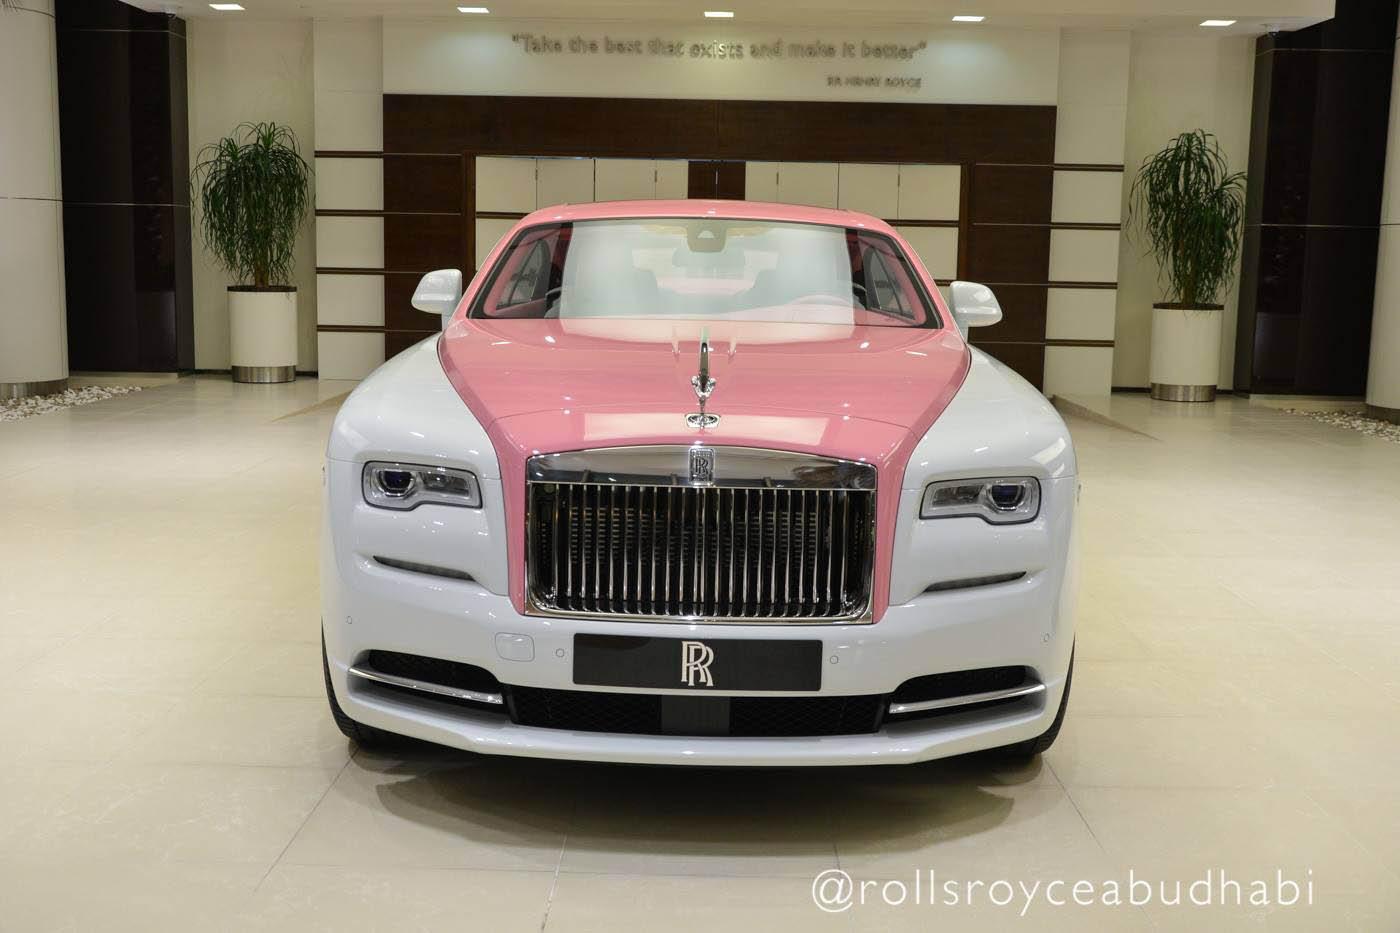 Pink_Rolls-Royce_Wraith_07